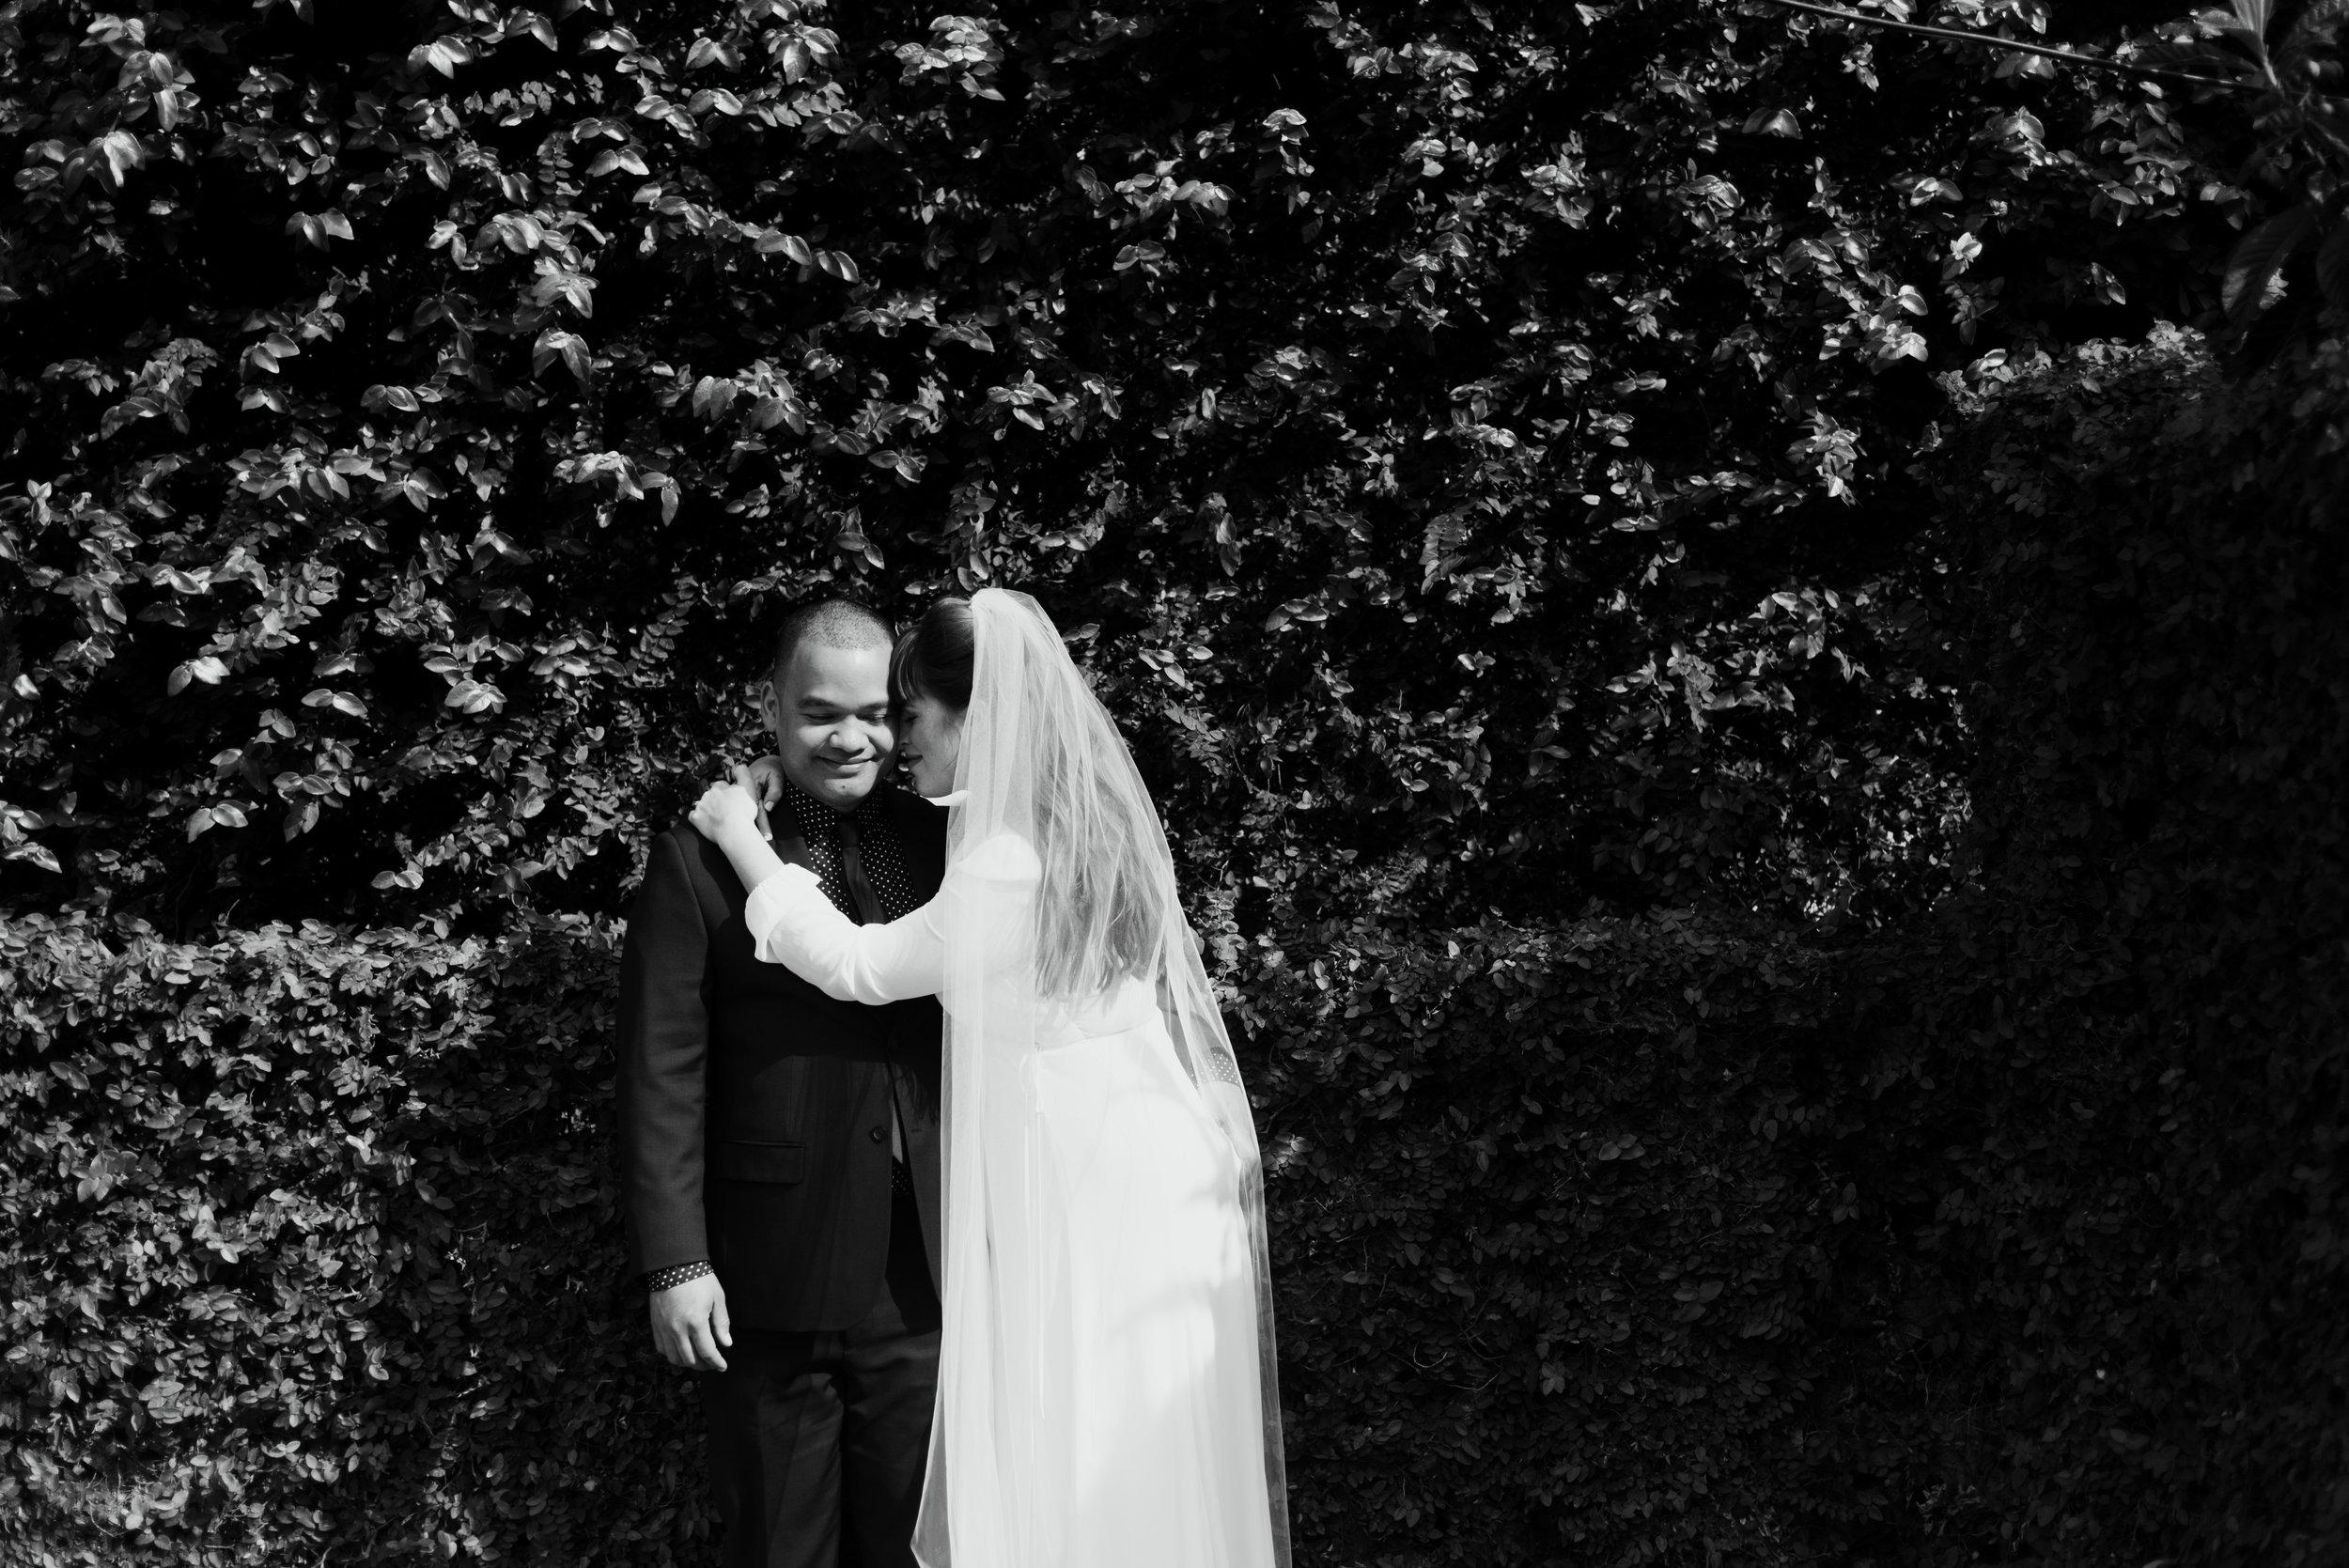 savannah-elopement-photography-savannah-georgia-elopement-photographer-savannah-wedding-photographer-meg-hill-photo-jade-hill- (18 of 58).jpg